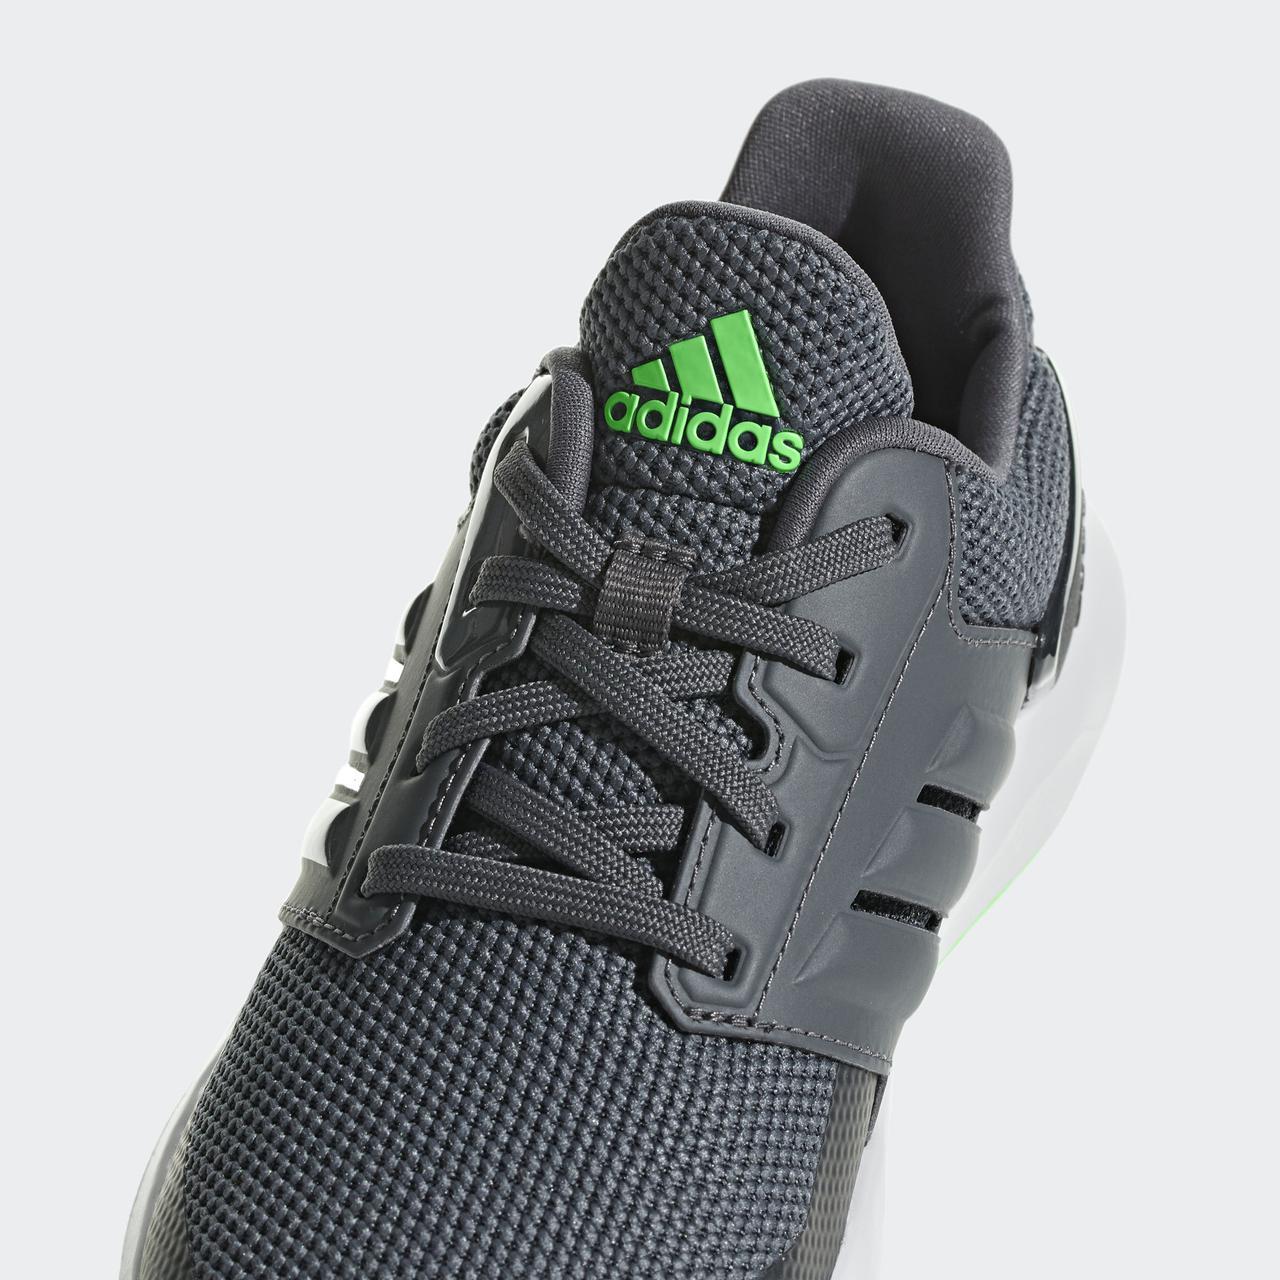 449642f657d2 ... Детские кроссовки Adidas Performance Rapidarun (Артикул  AH2594), ...